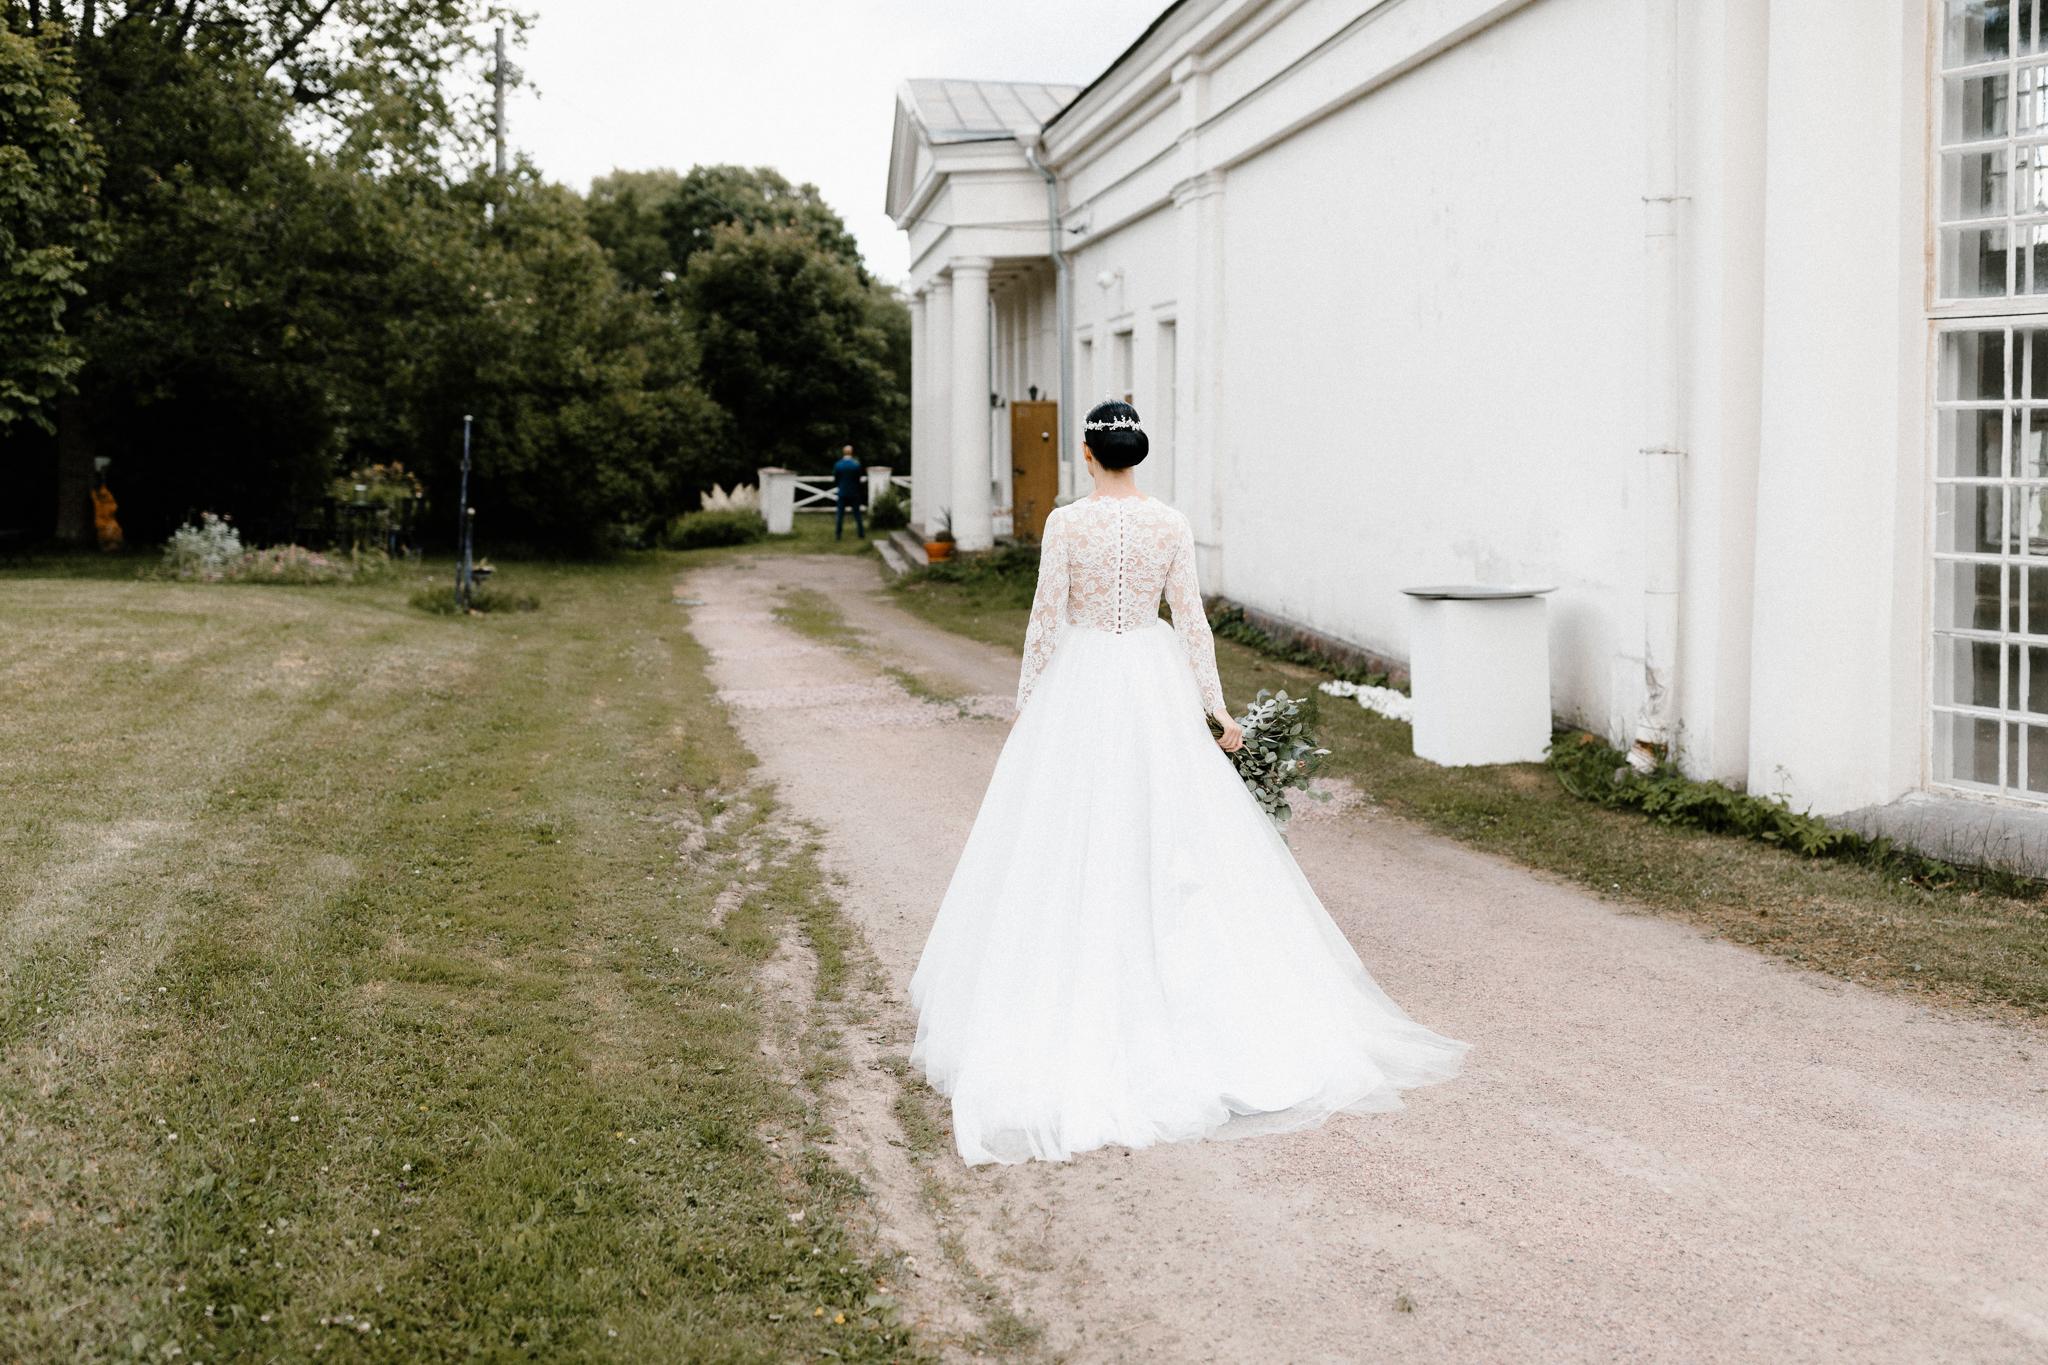 Essi + Ville   Oitbacka Gården   by Patrick Karkkolainen Wedding Photography-37.jpg